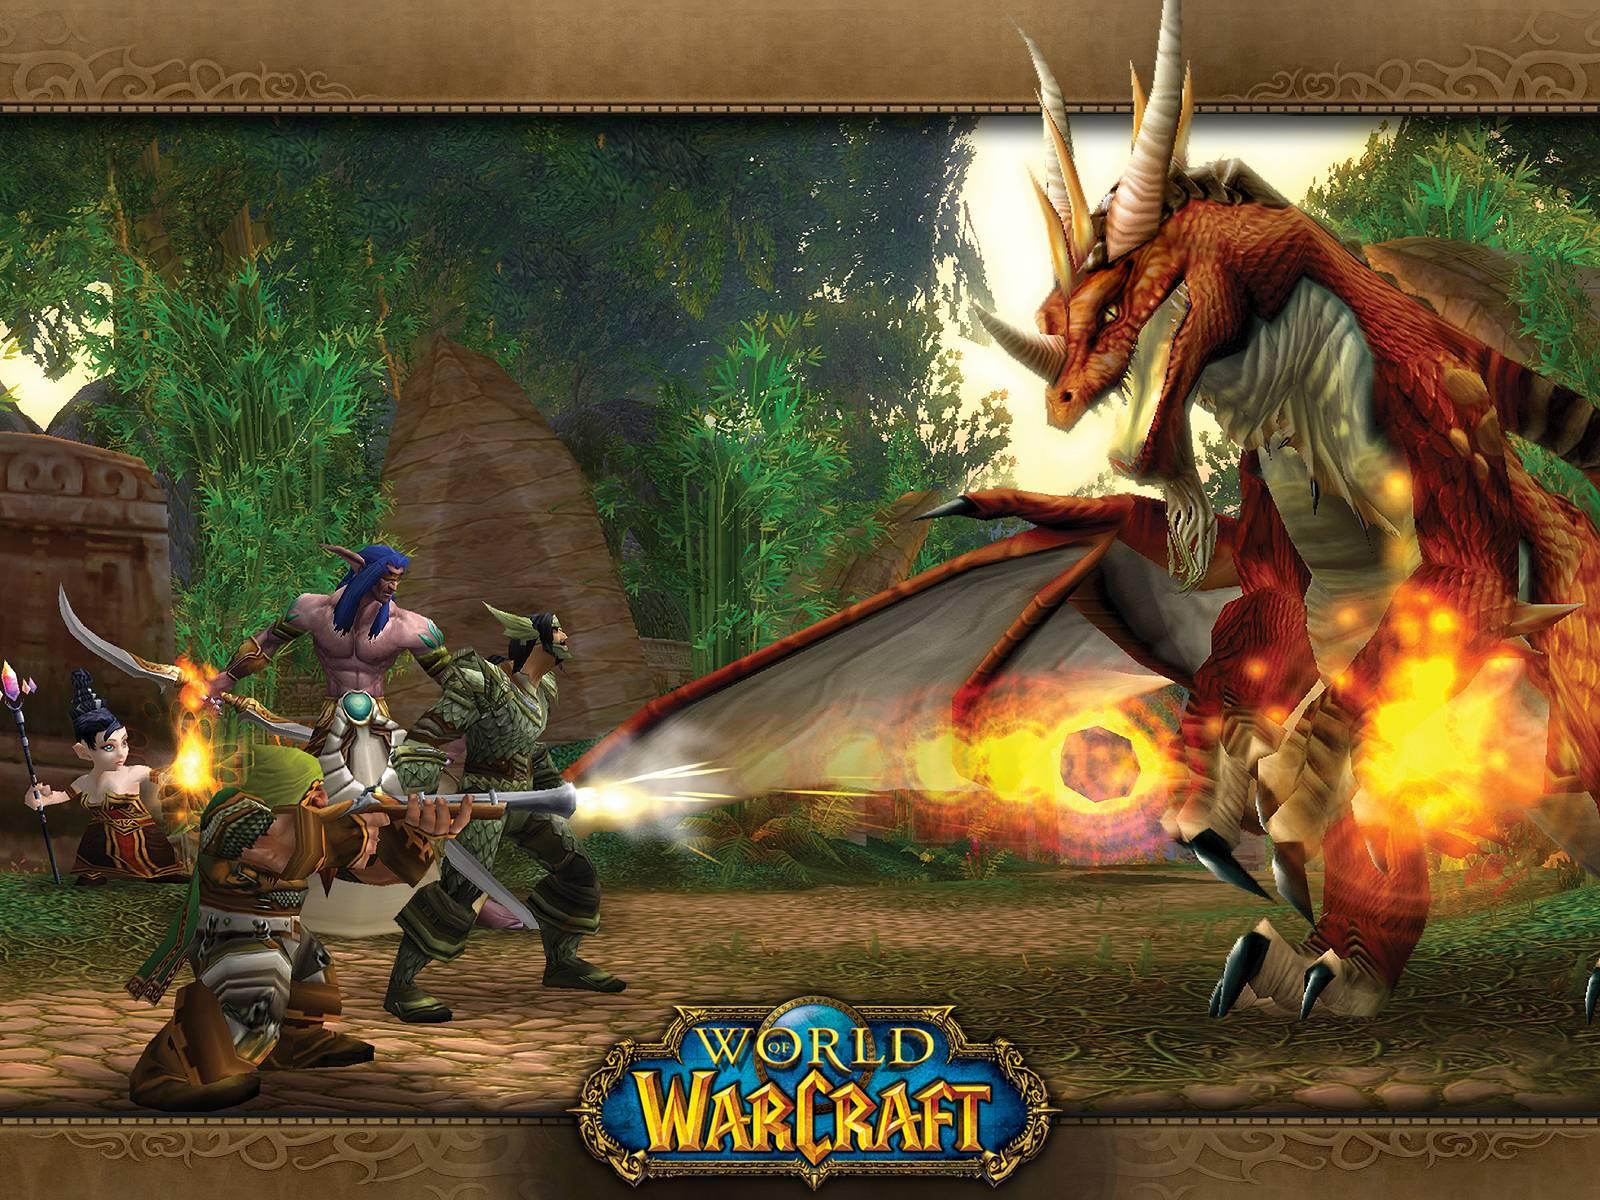 Wallpaper Backgrounds: World Warcraft - Games